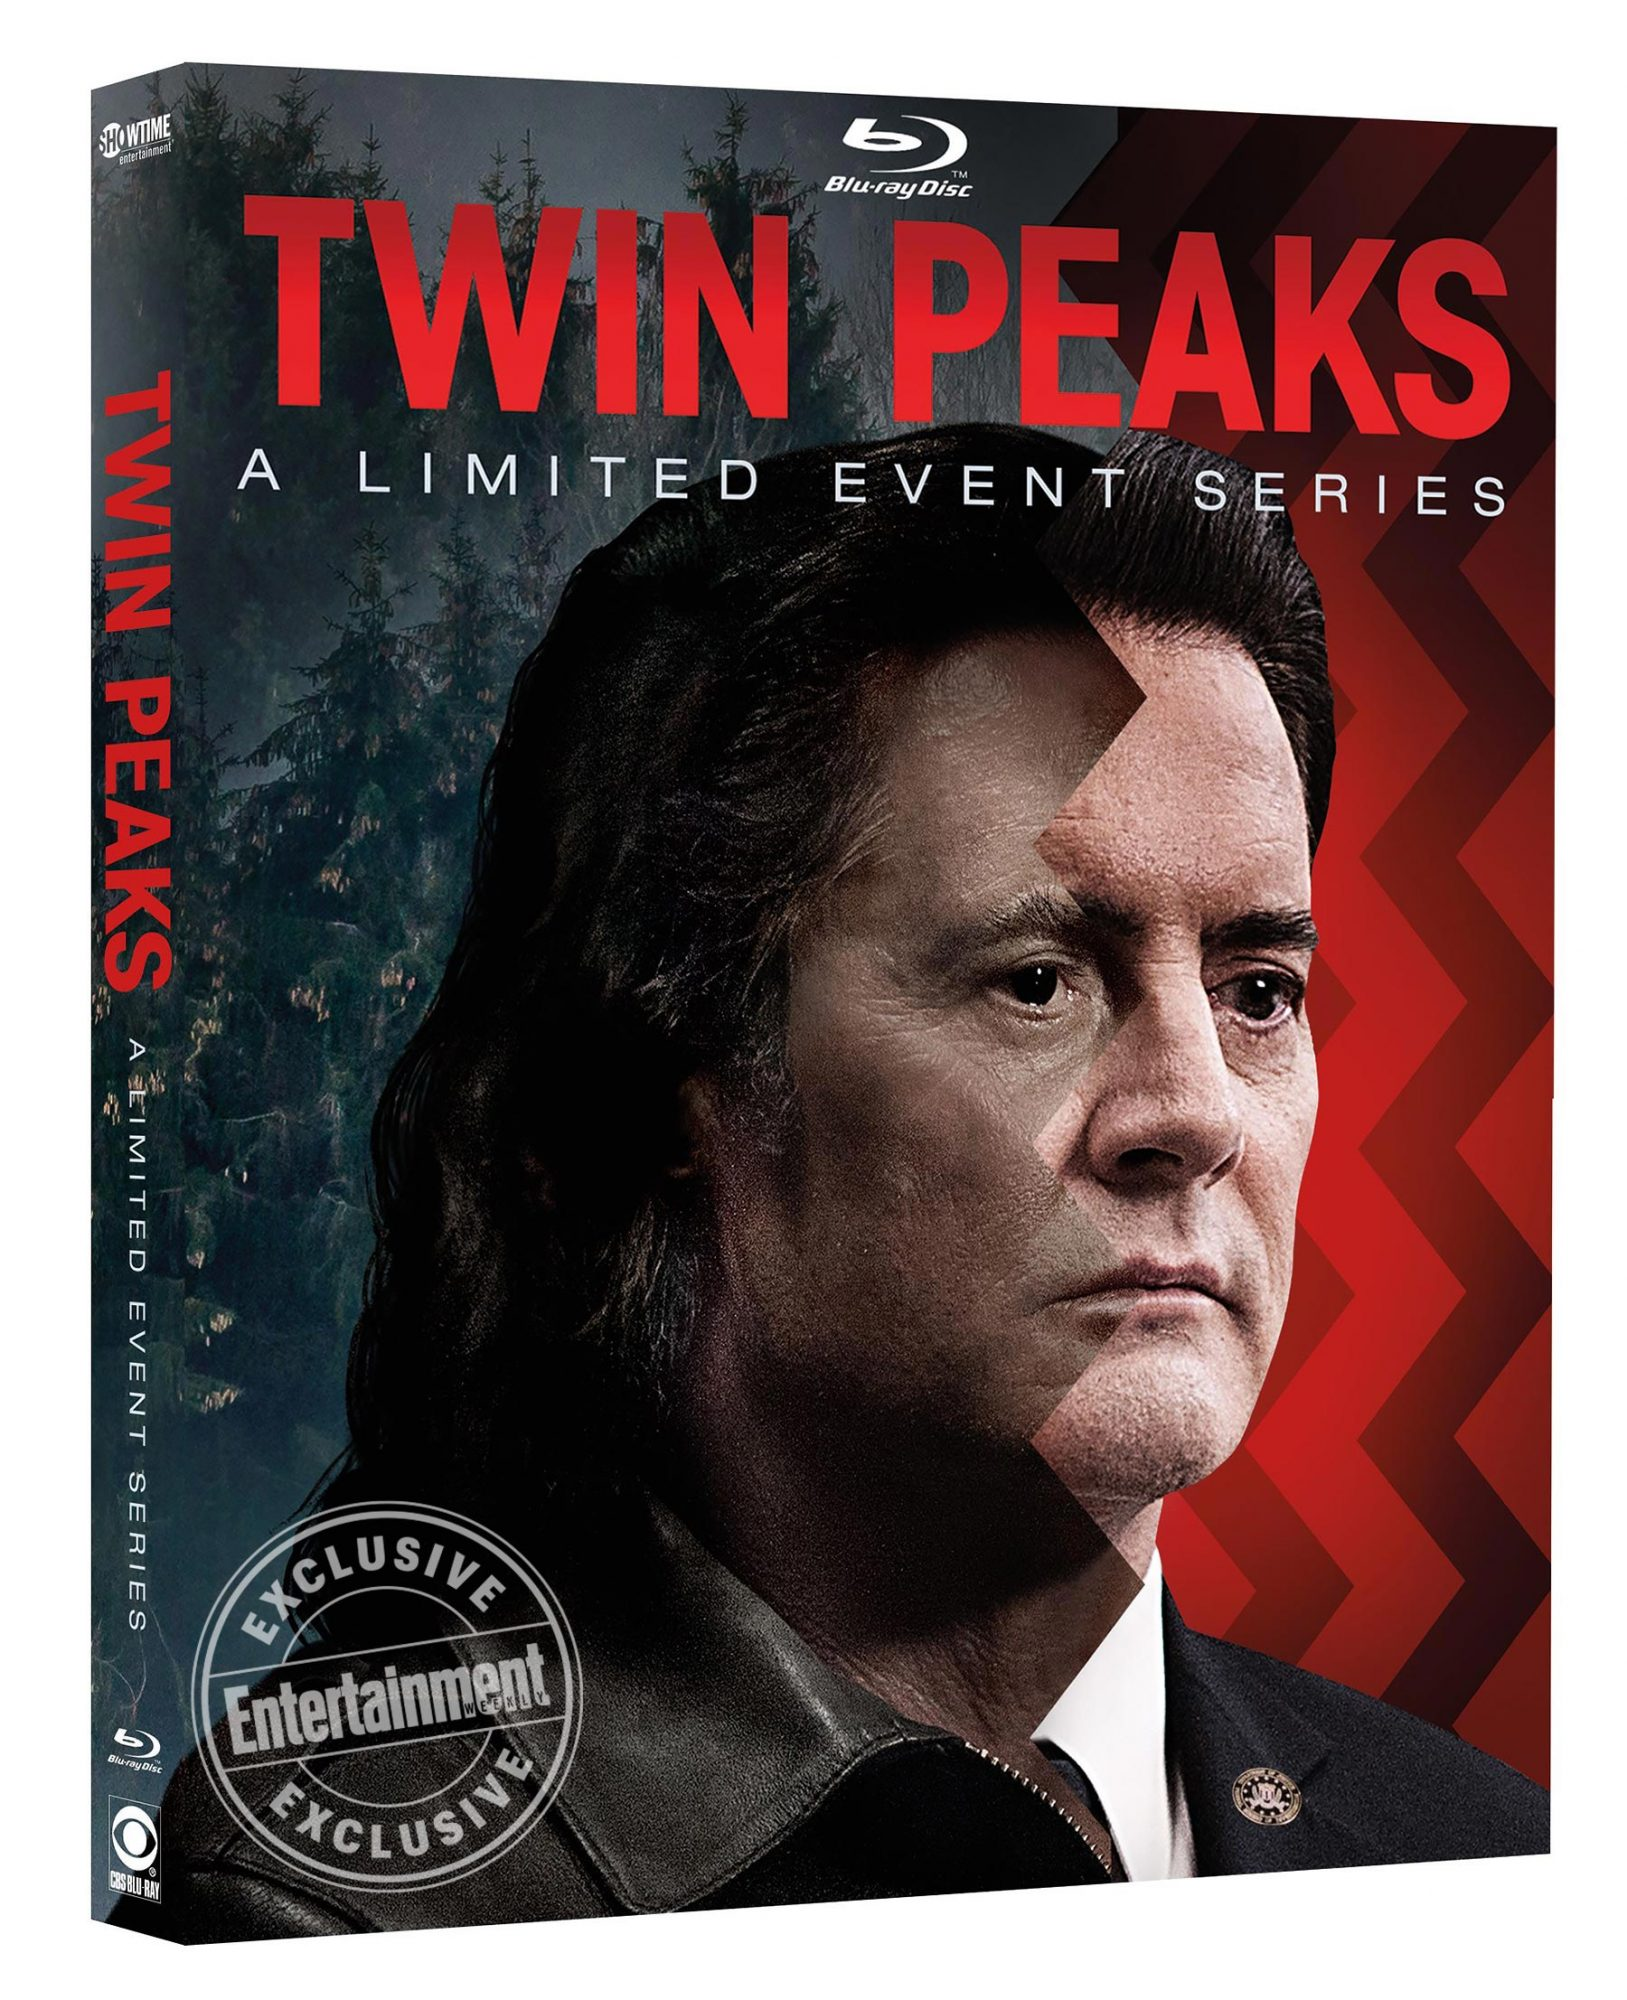 Twin Peaks (2017) Blu-ray / DVD Box art CR: Showtime